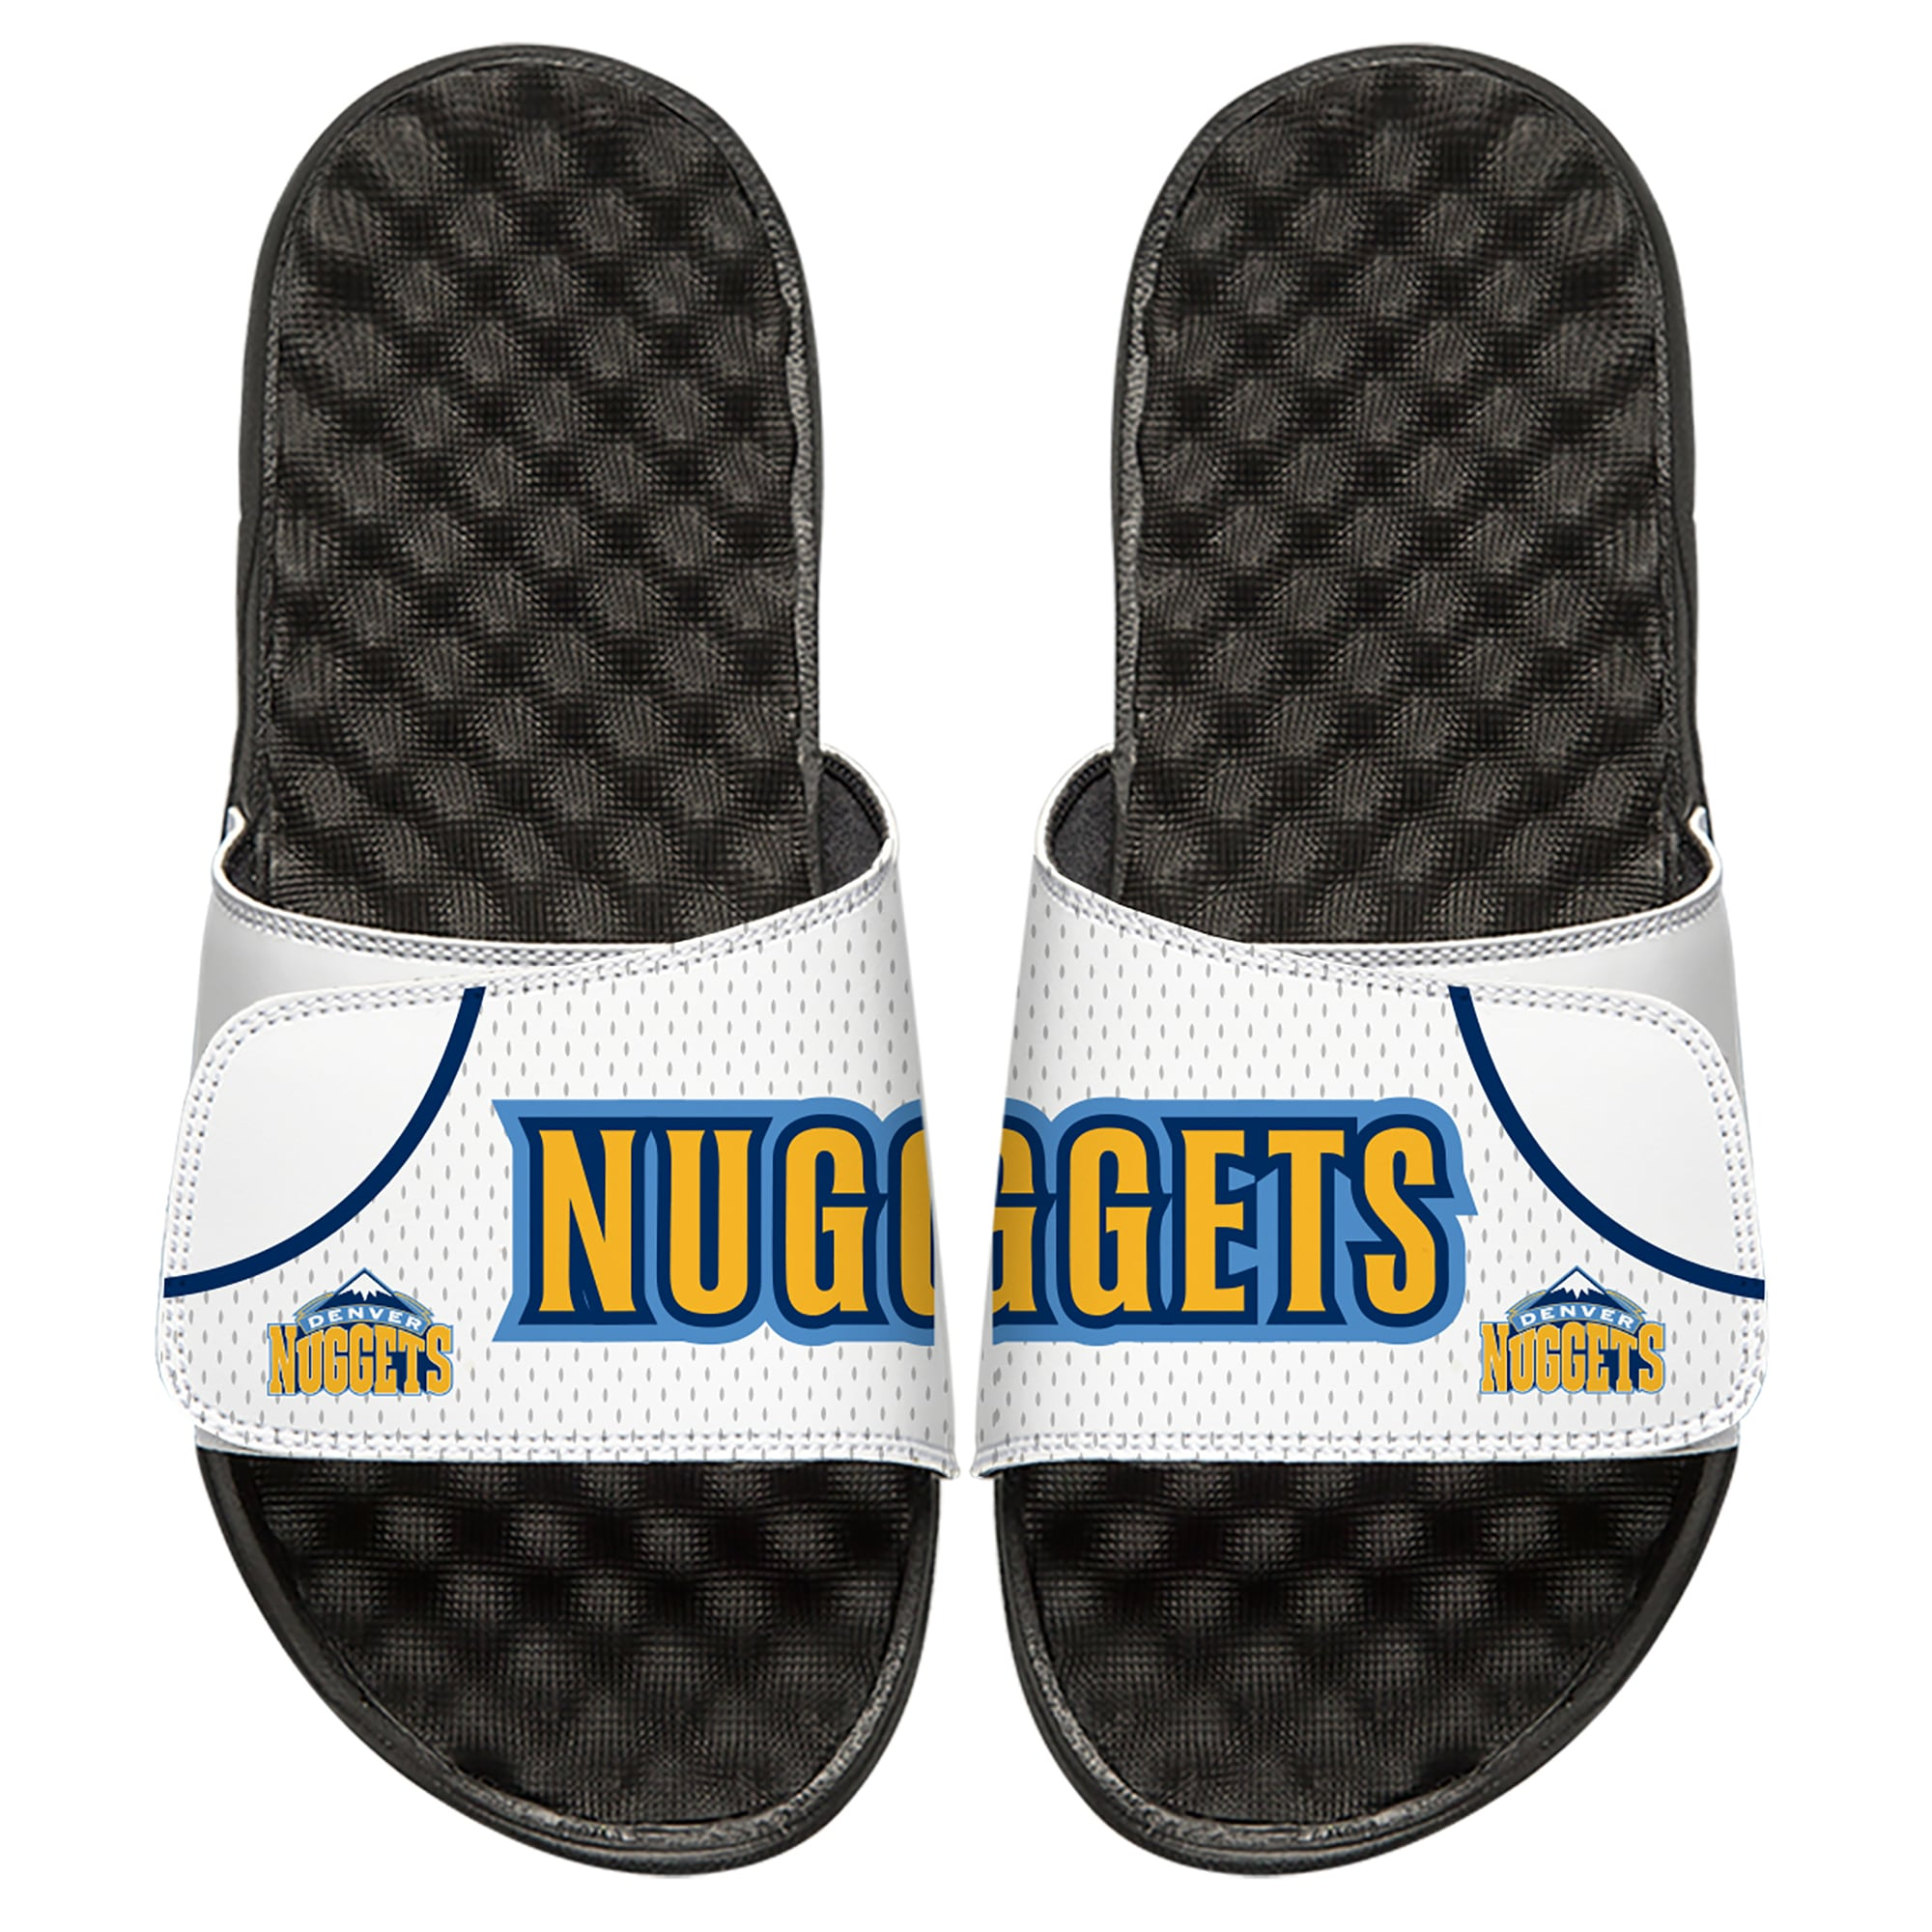 Denver Nuggets ISlide Youth Home Jersey Slide Sandals - White